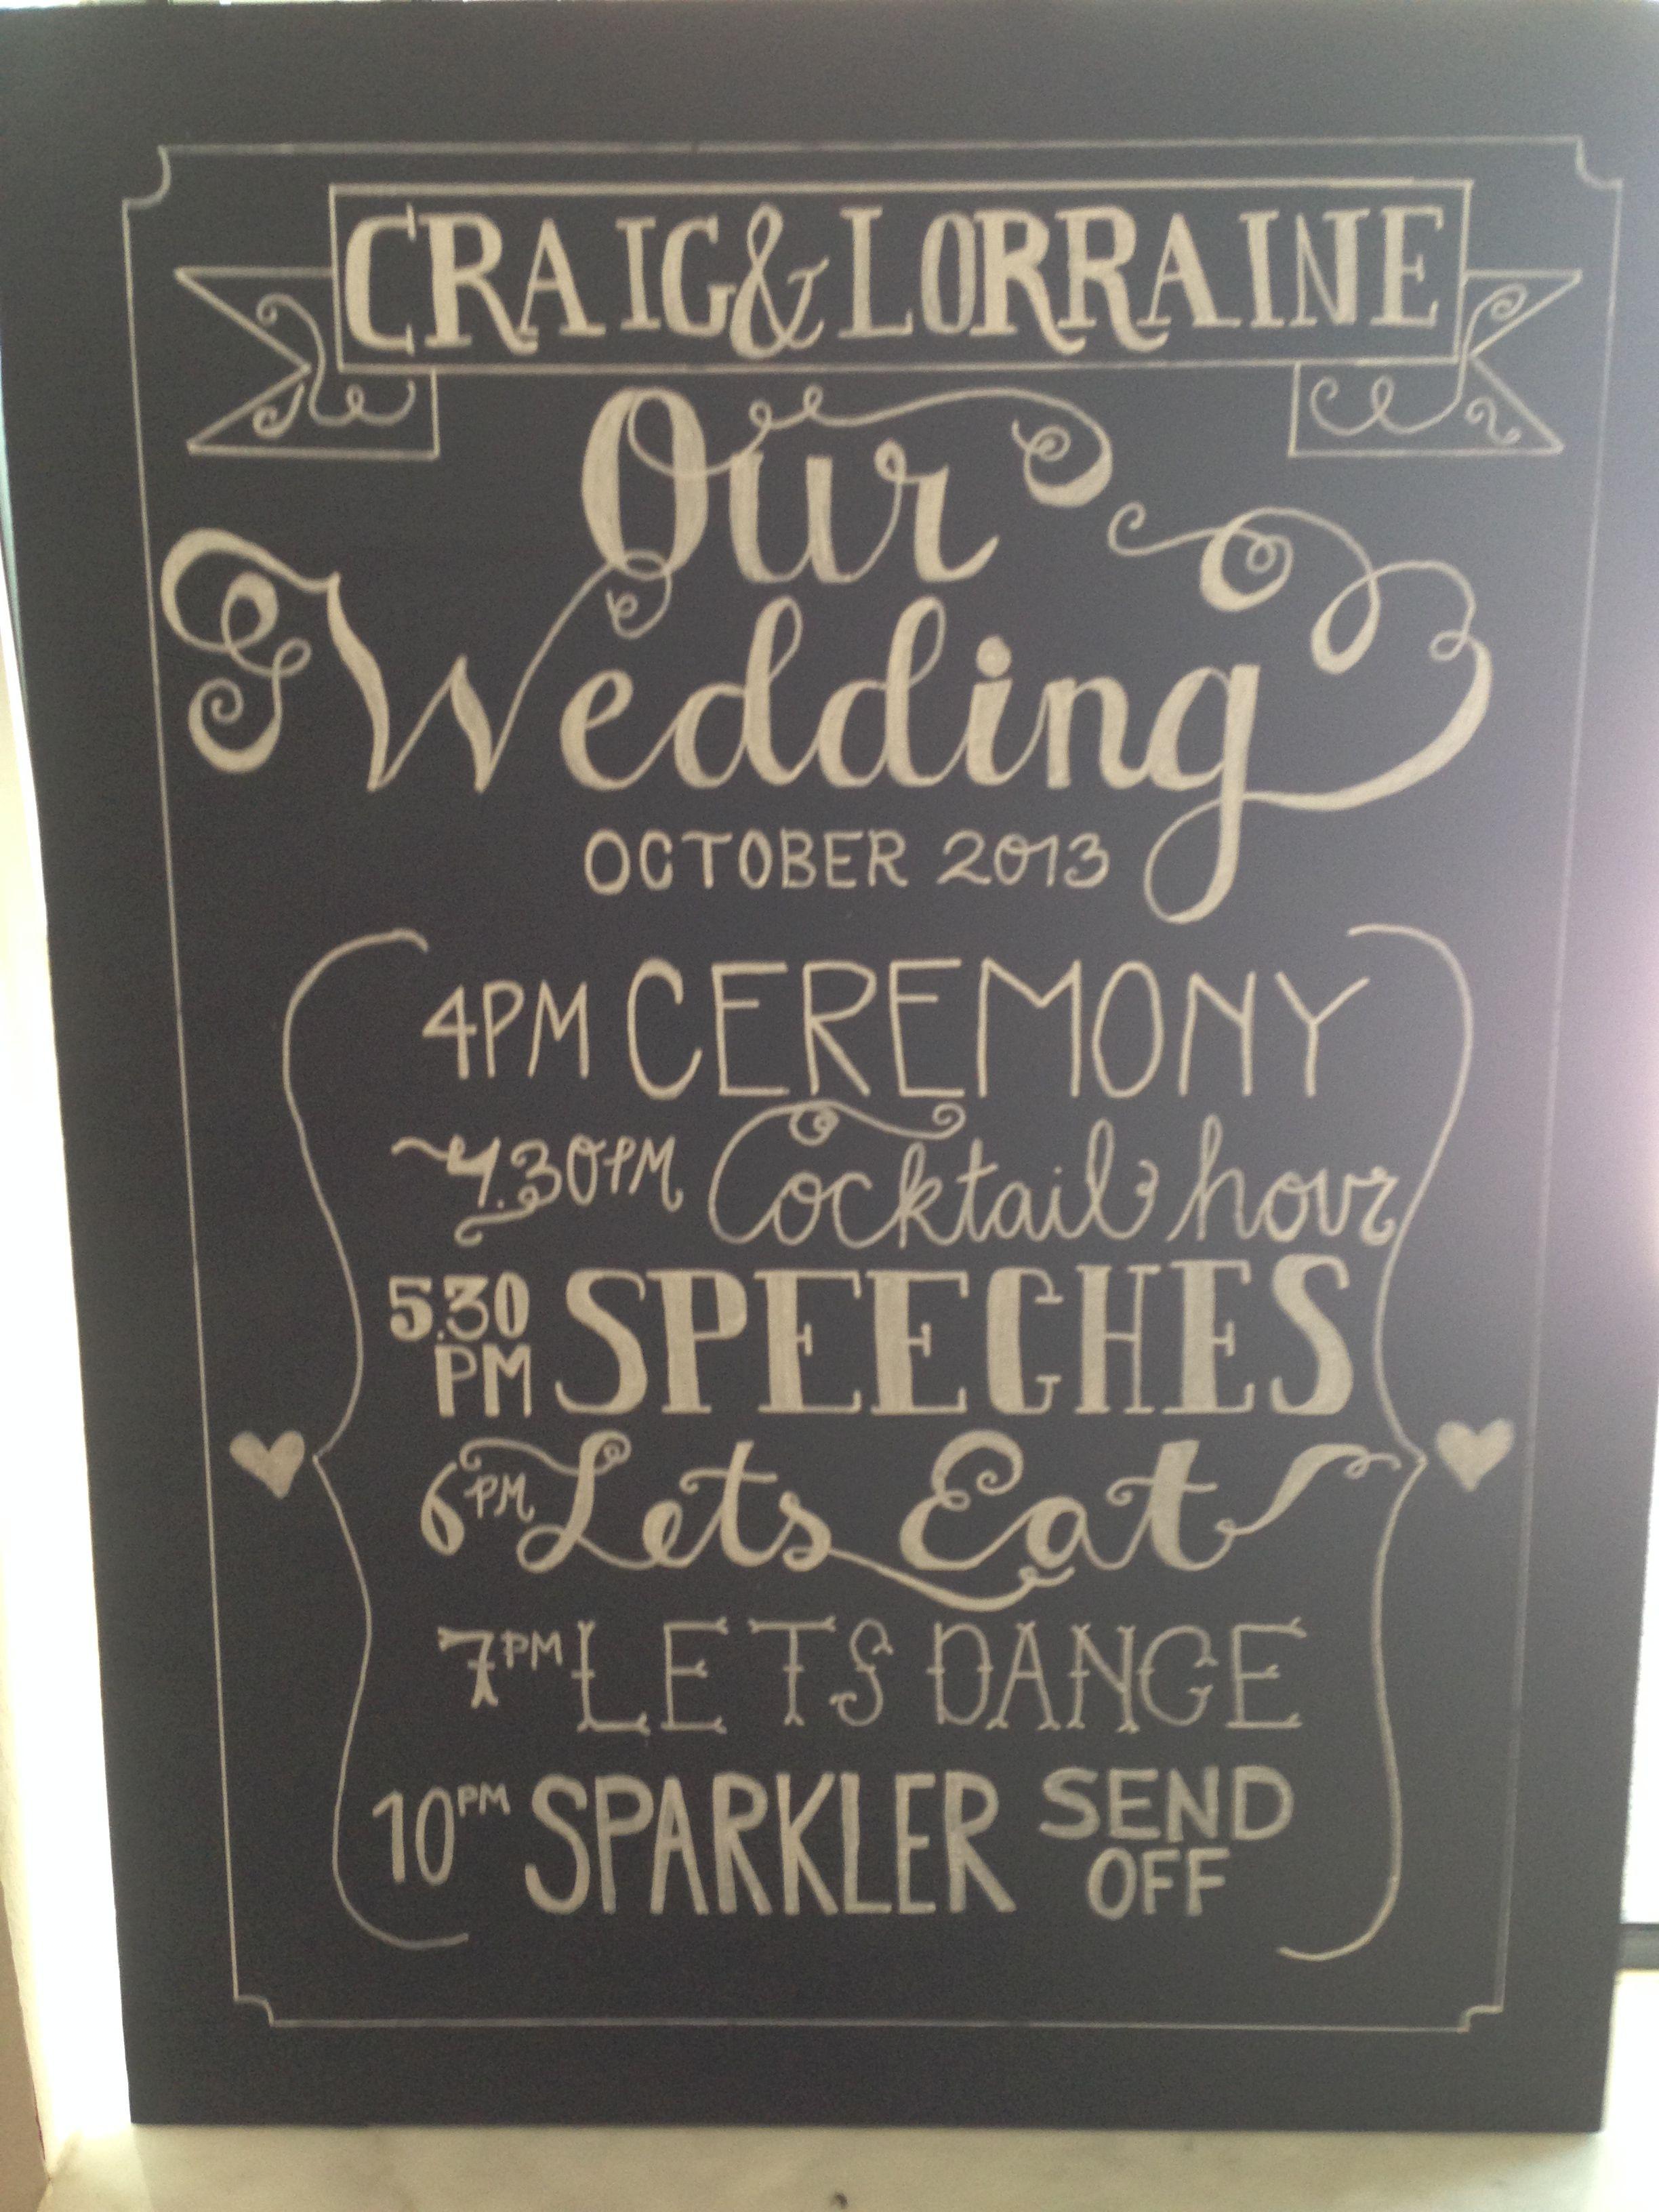 I love the idea of a wedding